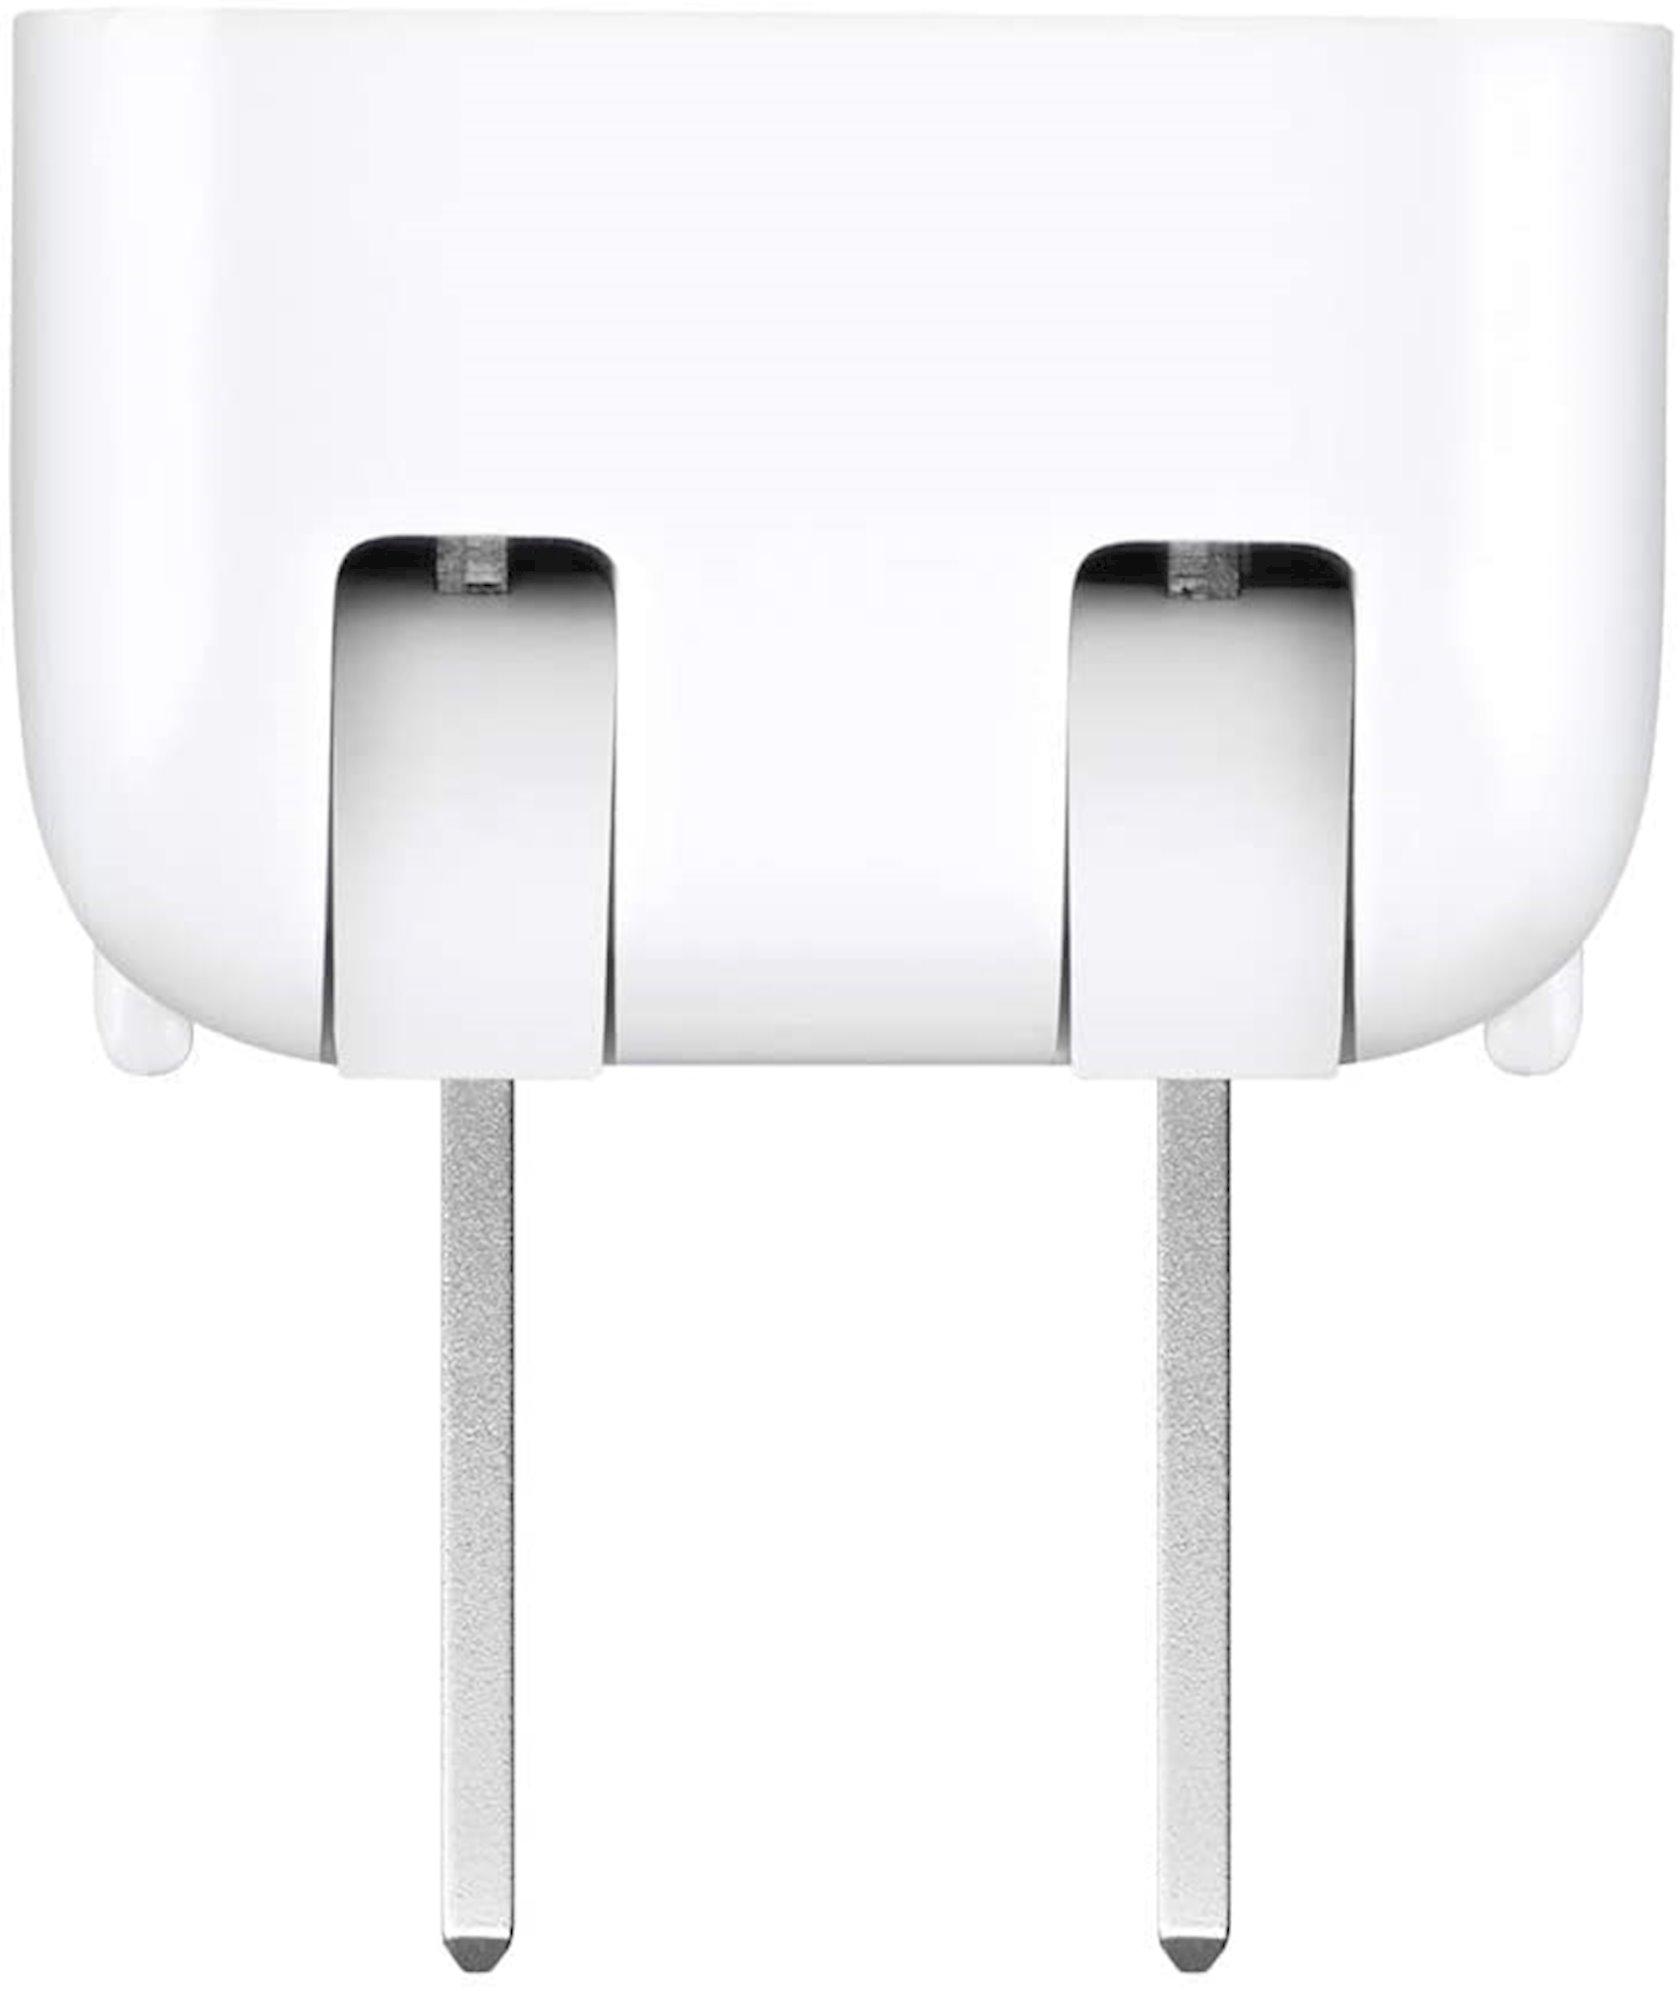 Adapter dəsti Apple World Travel Adapter Kit